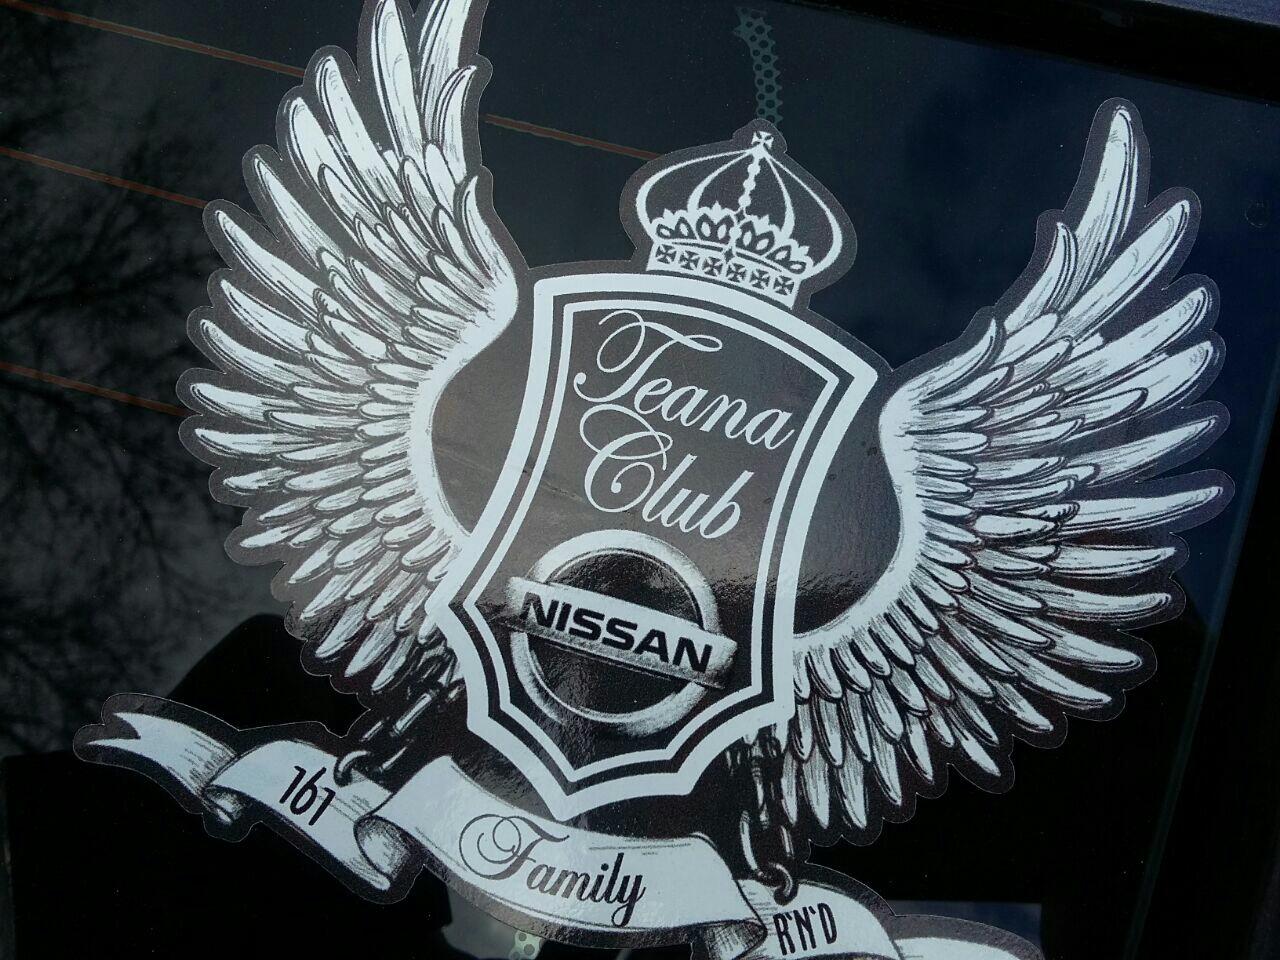 Теана клуб j32 москва ниссан англия мужские клубы